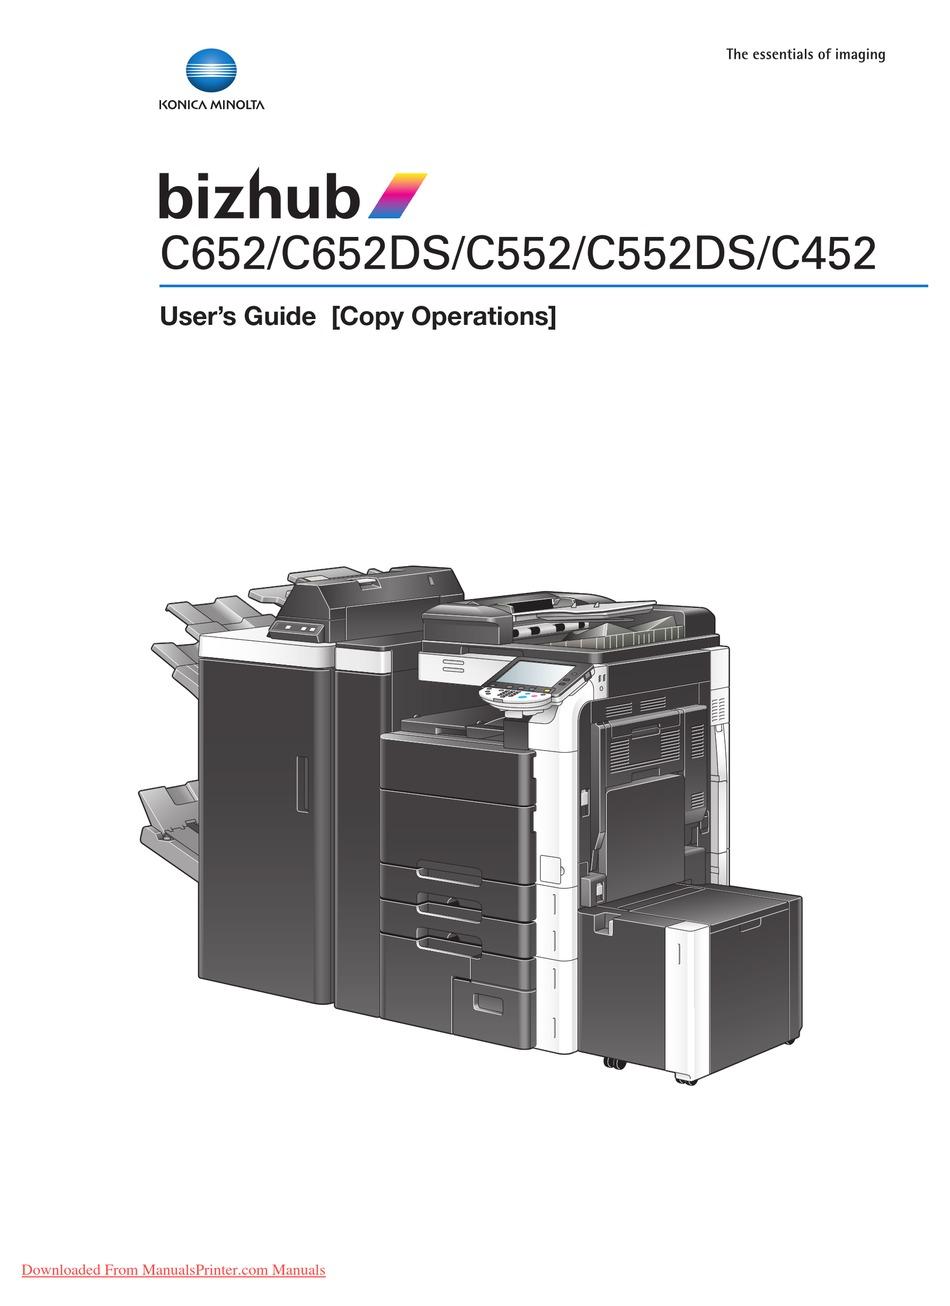 Bizhub C452 Driver - visualclever